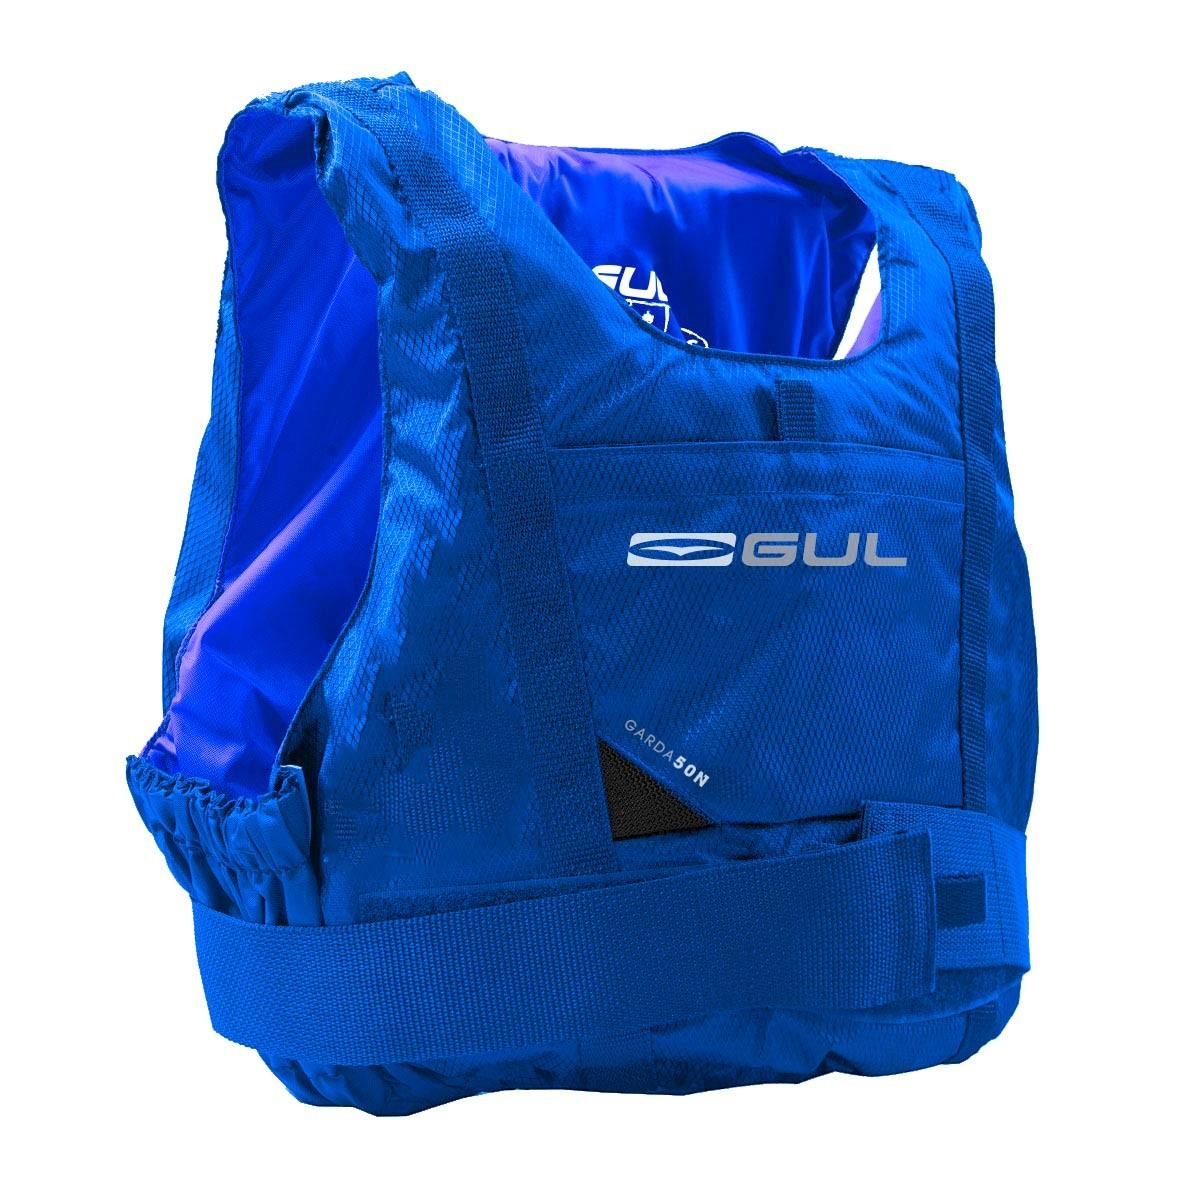 záchranná vesta GUL Garda 50N GM0002 modrá - L